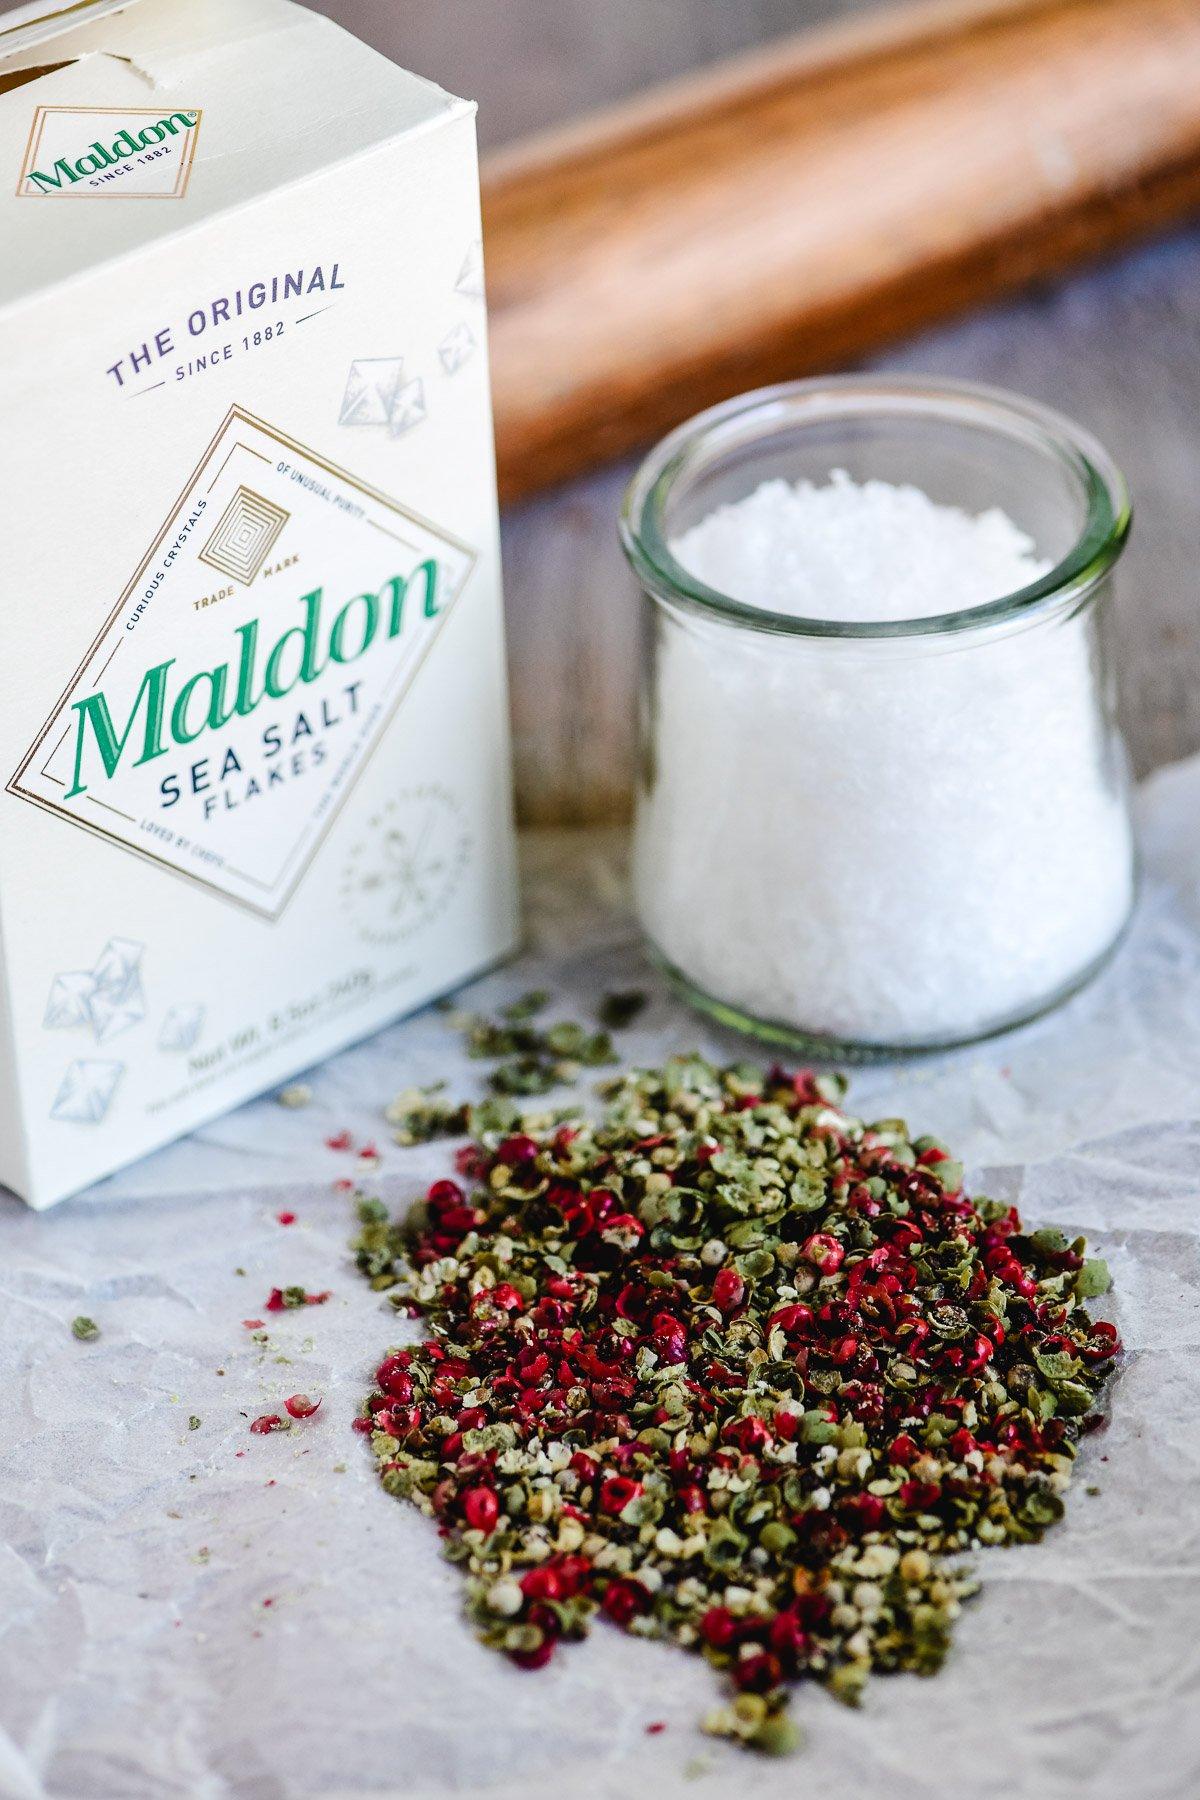 tricolor peppercorns and malden salt